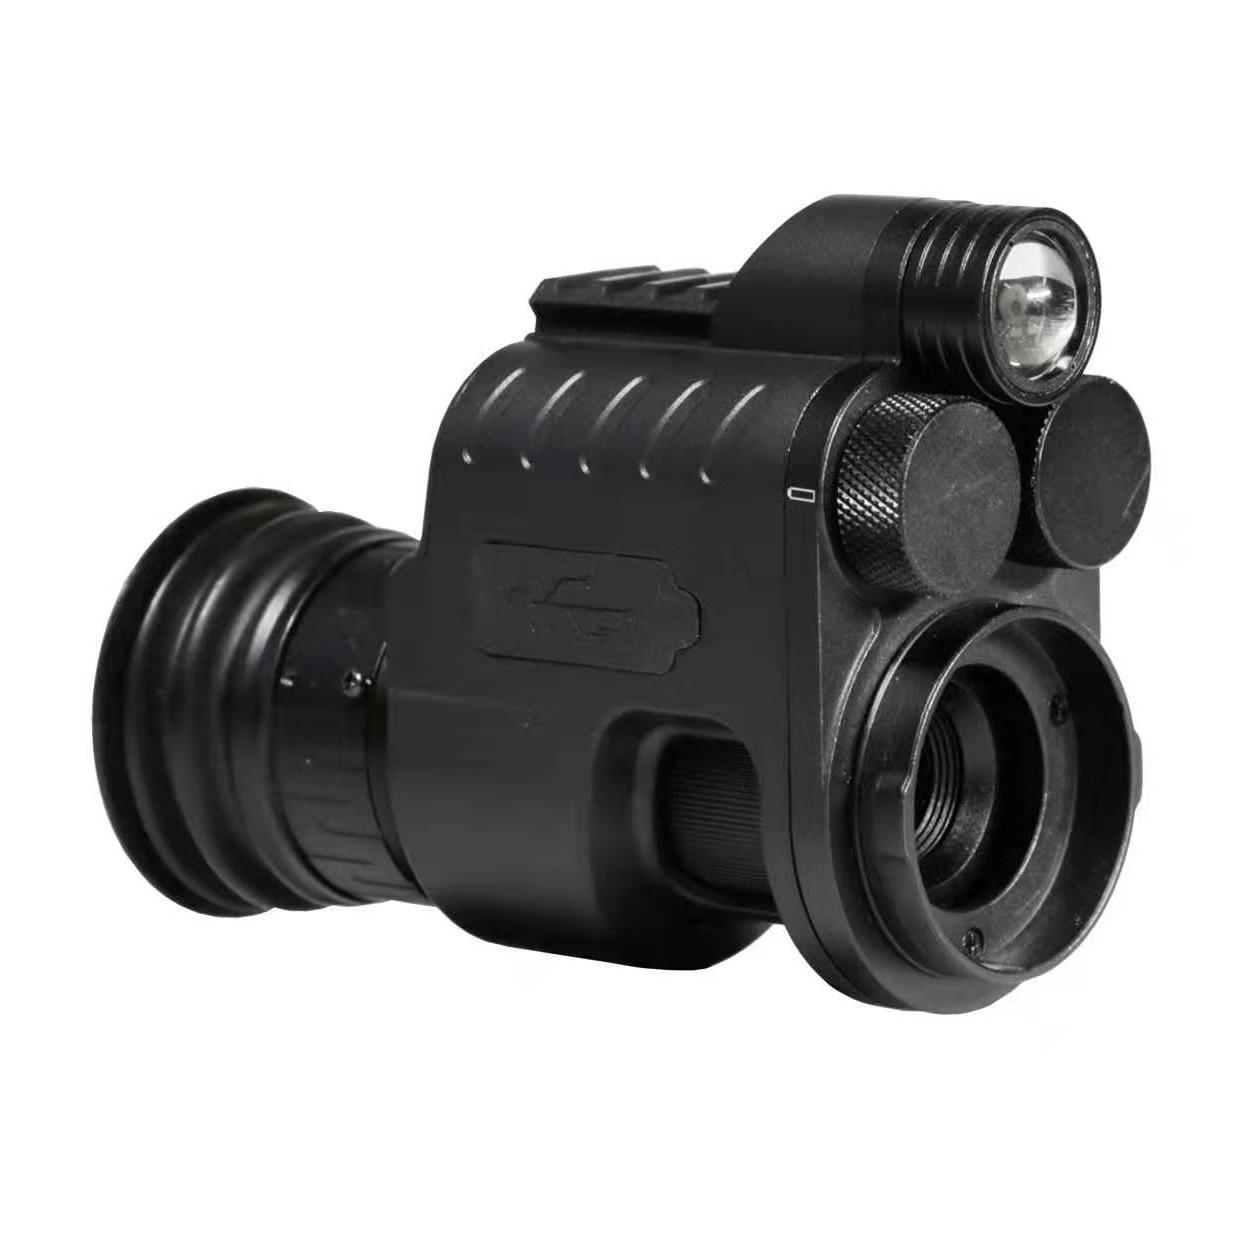 007 Digital Hunting Night Vision Scope Cameras 5w DIY/IR/Infrared Night Vision Riflescope  200M Range Night Rifle Optical